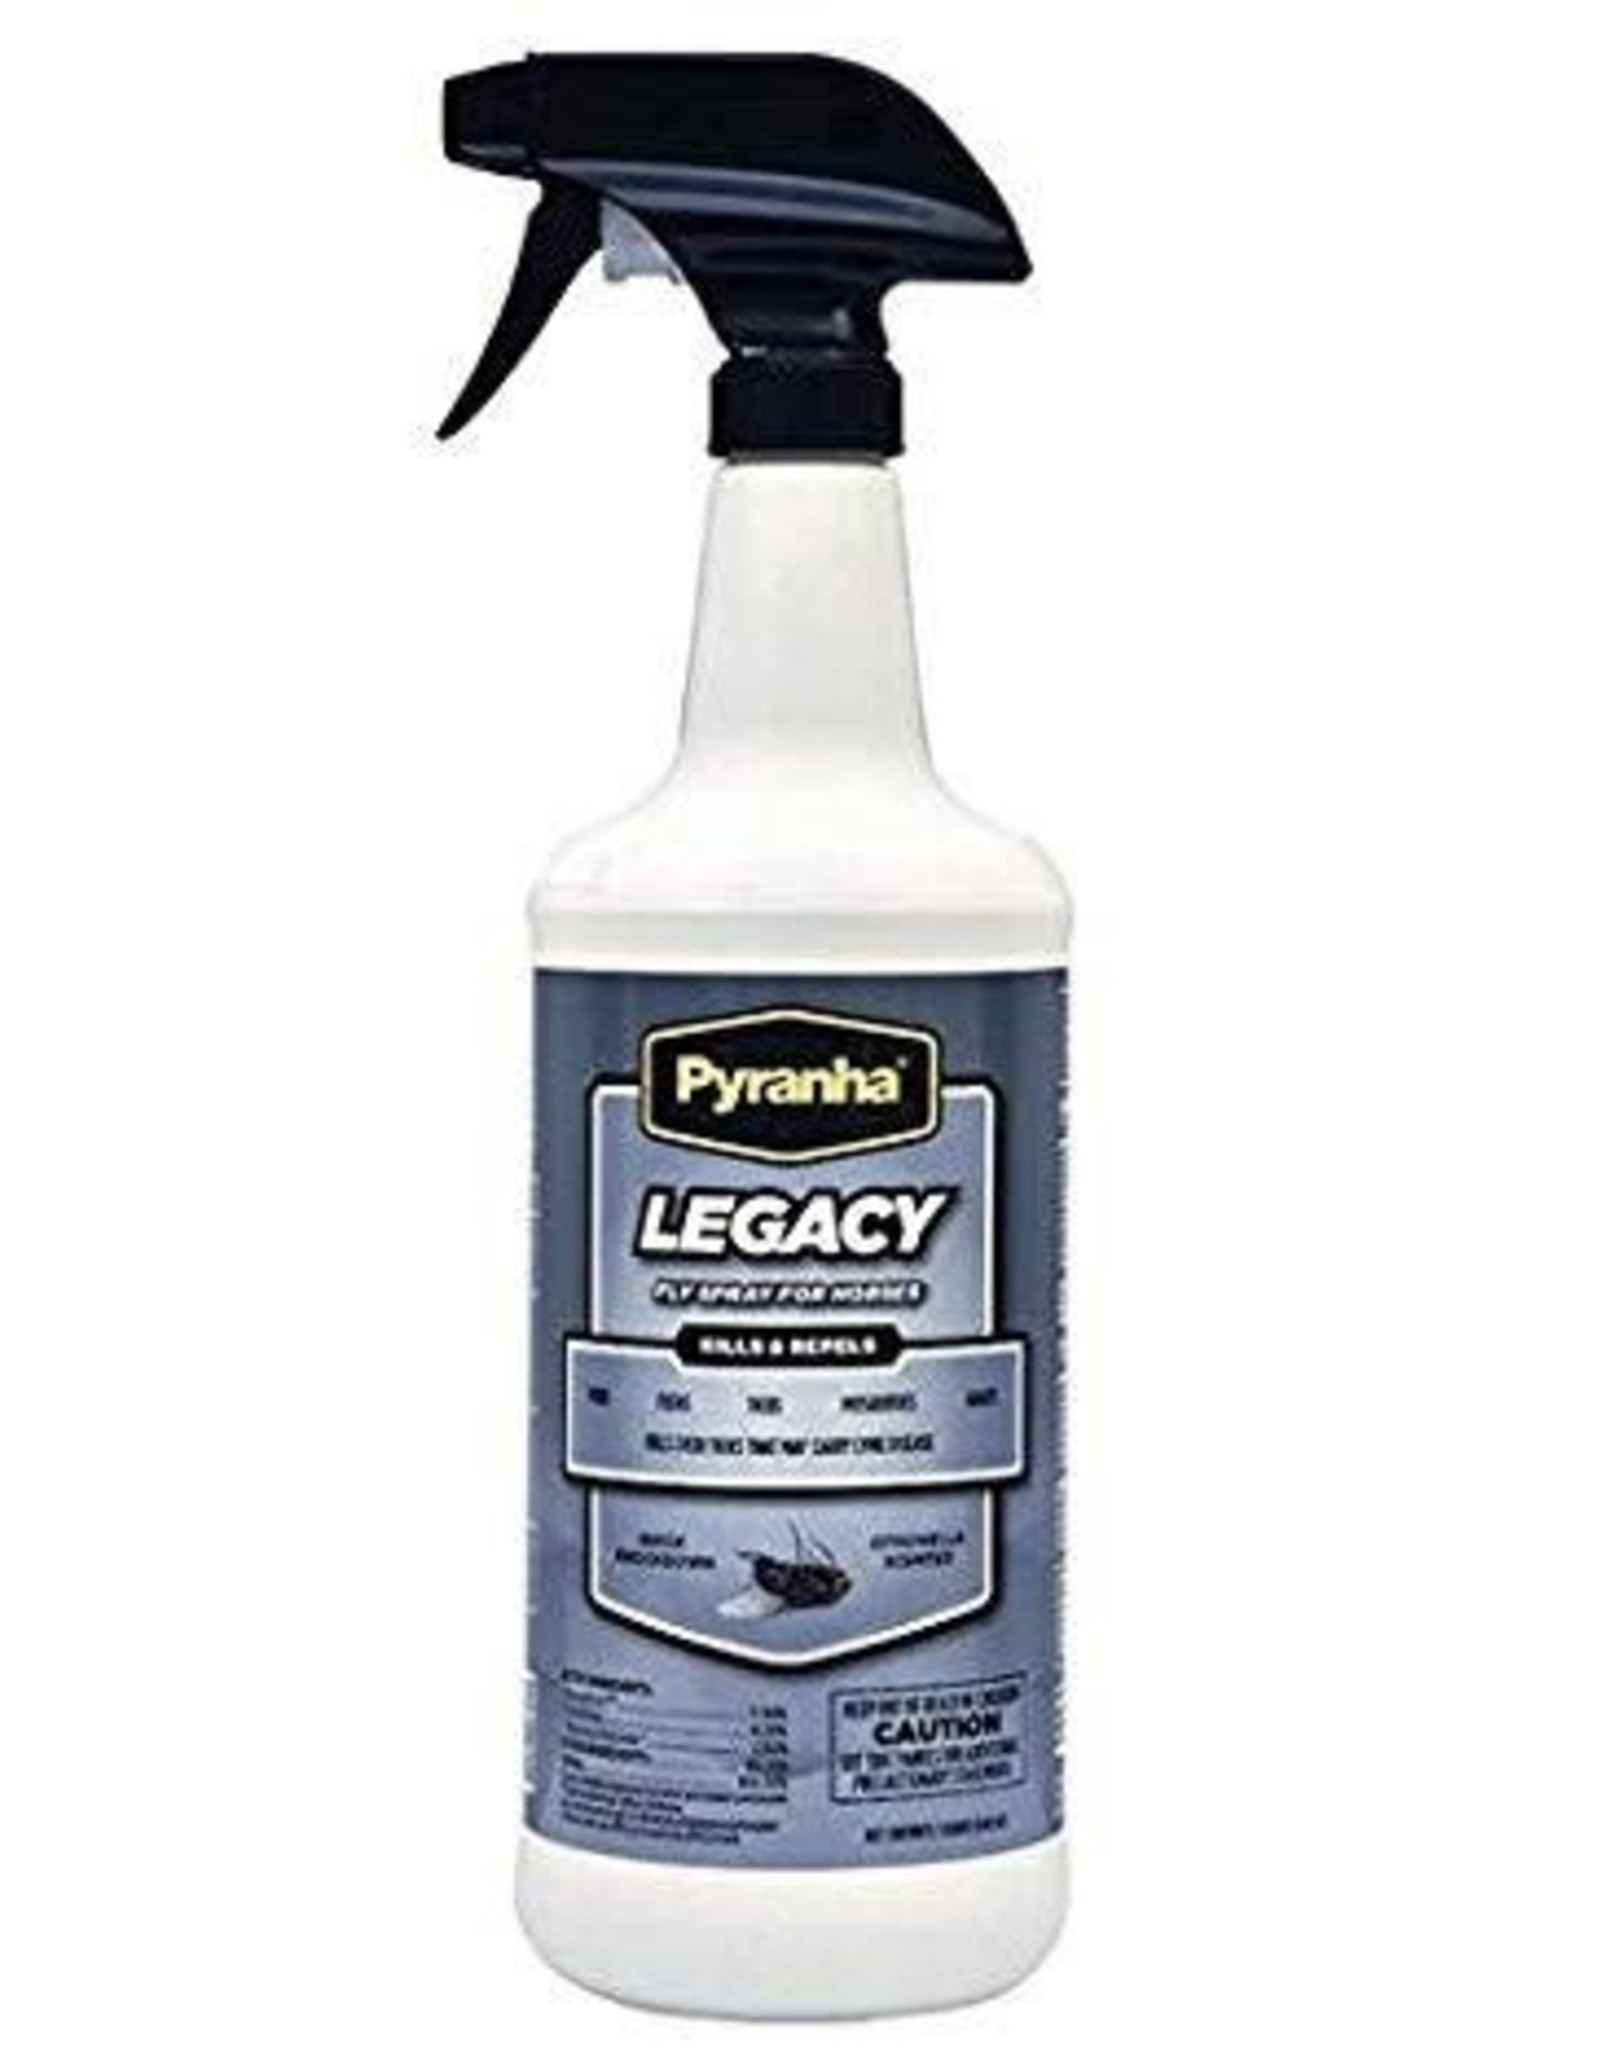 Pyranha Legacy Fly Repellent - 32oz